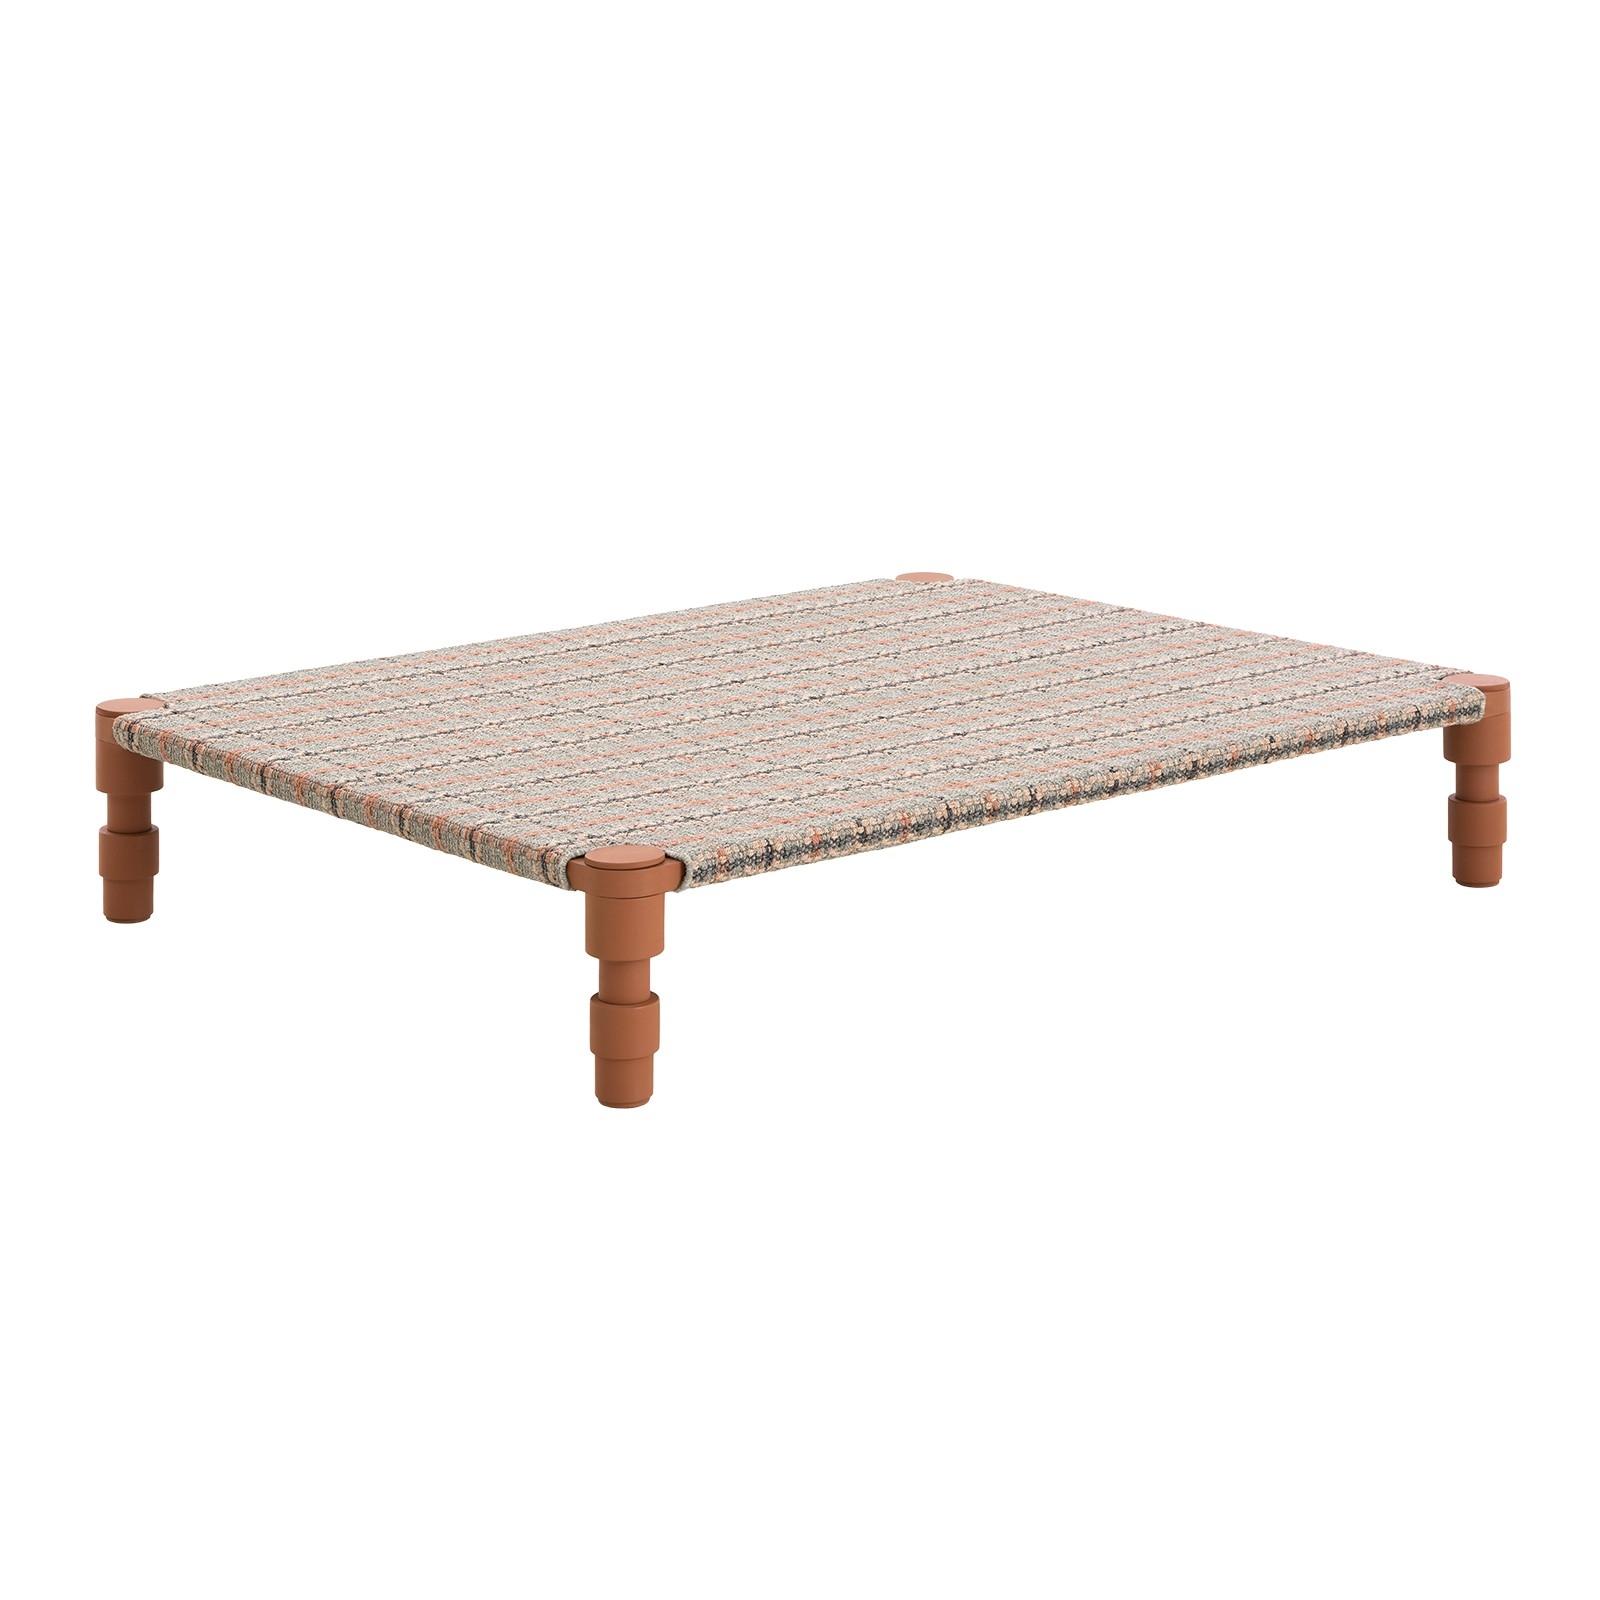 Gan designové zahradní sedačky Garden Layers Indian Double Bed Terracotta